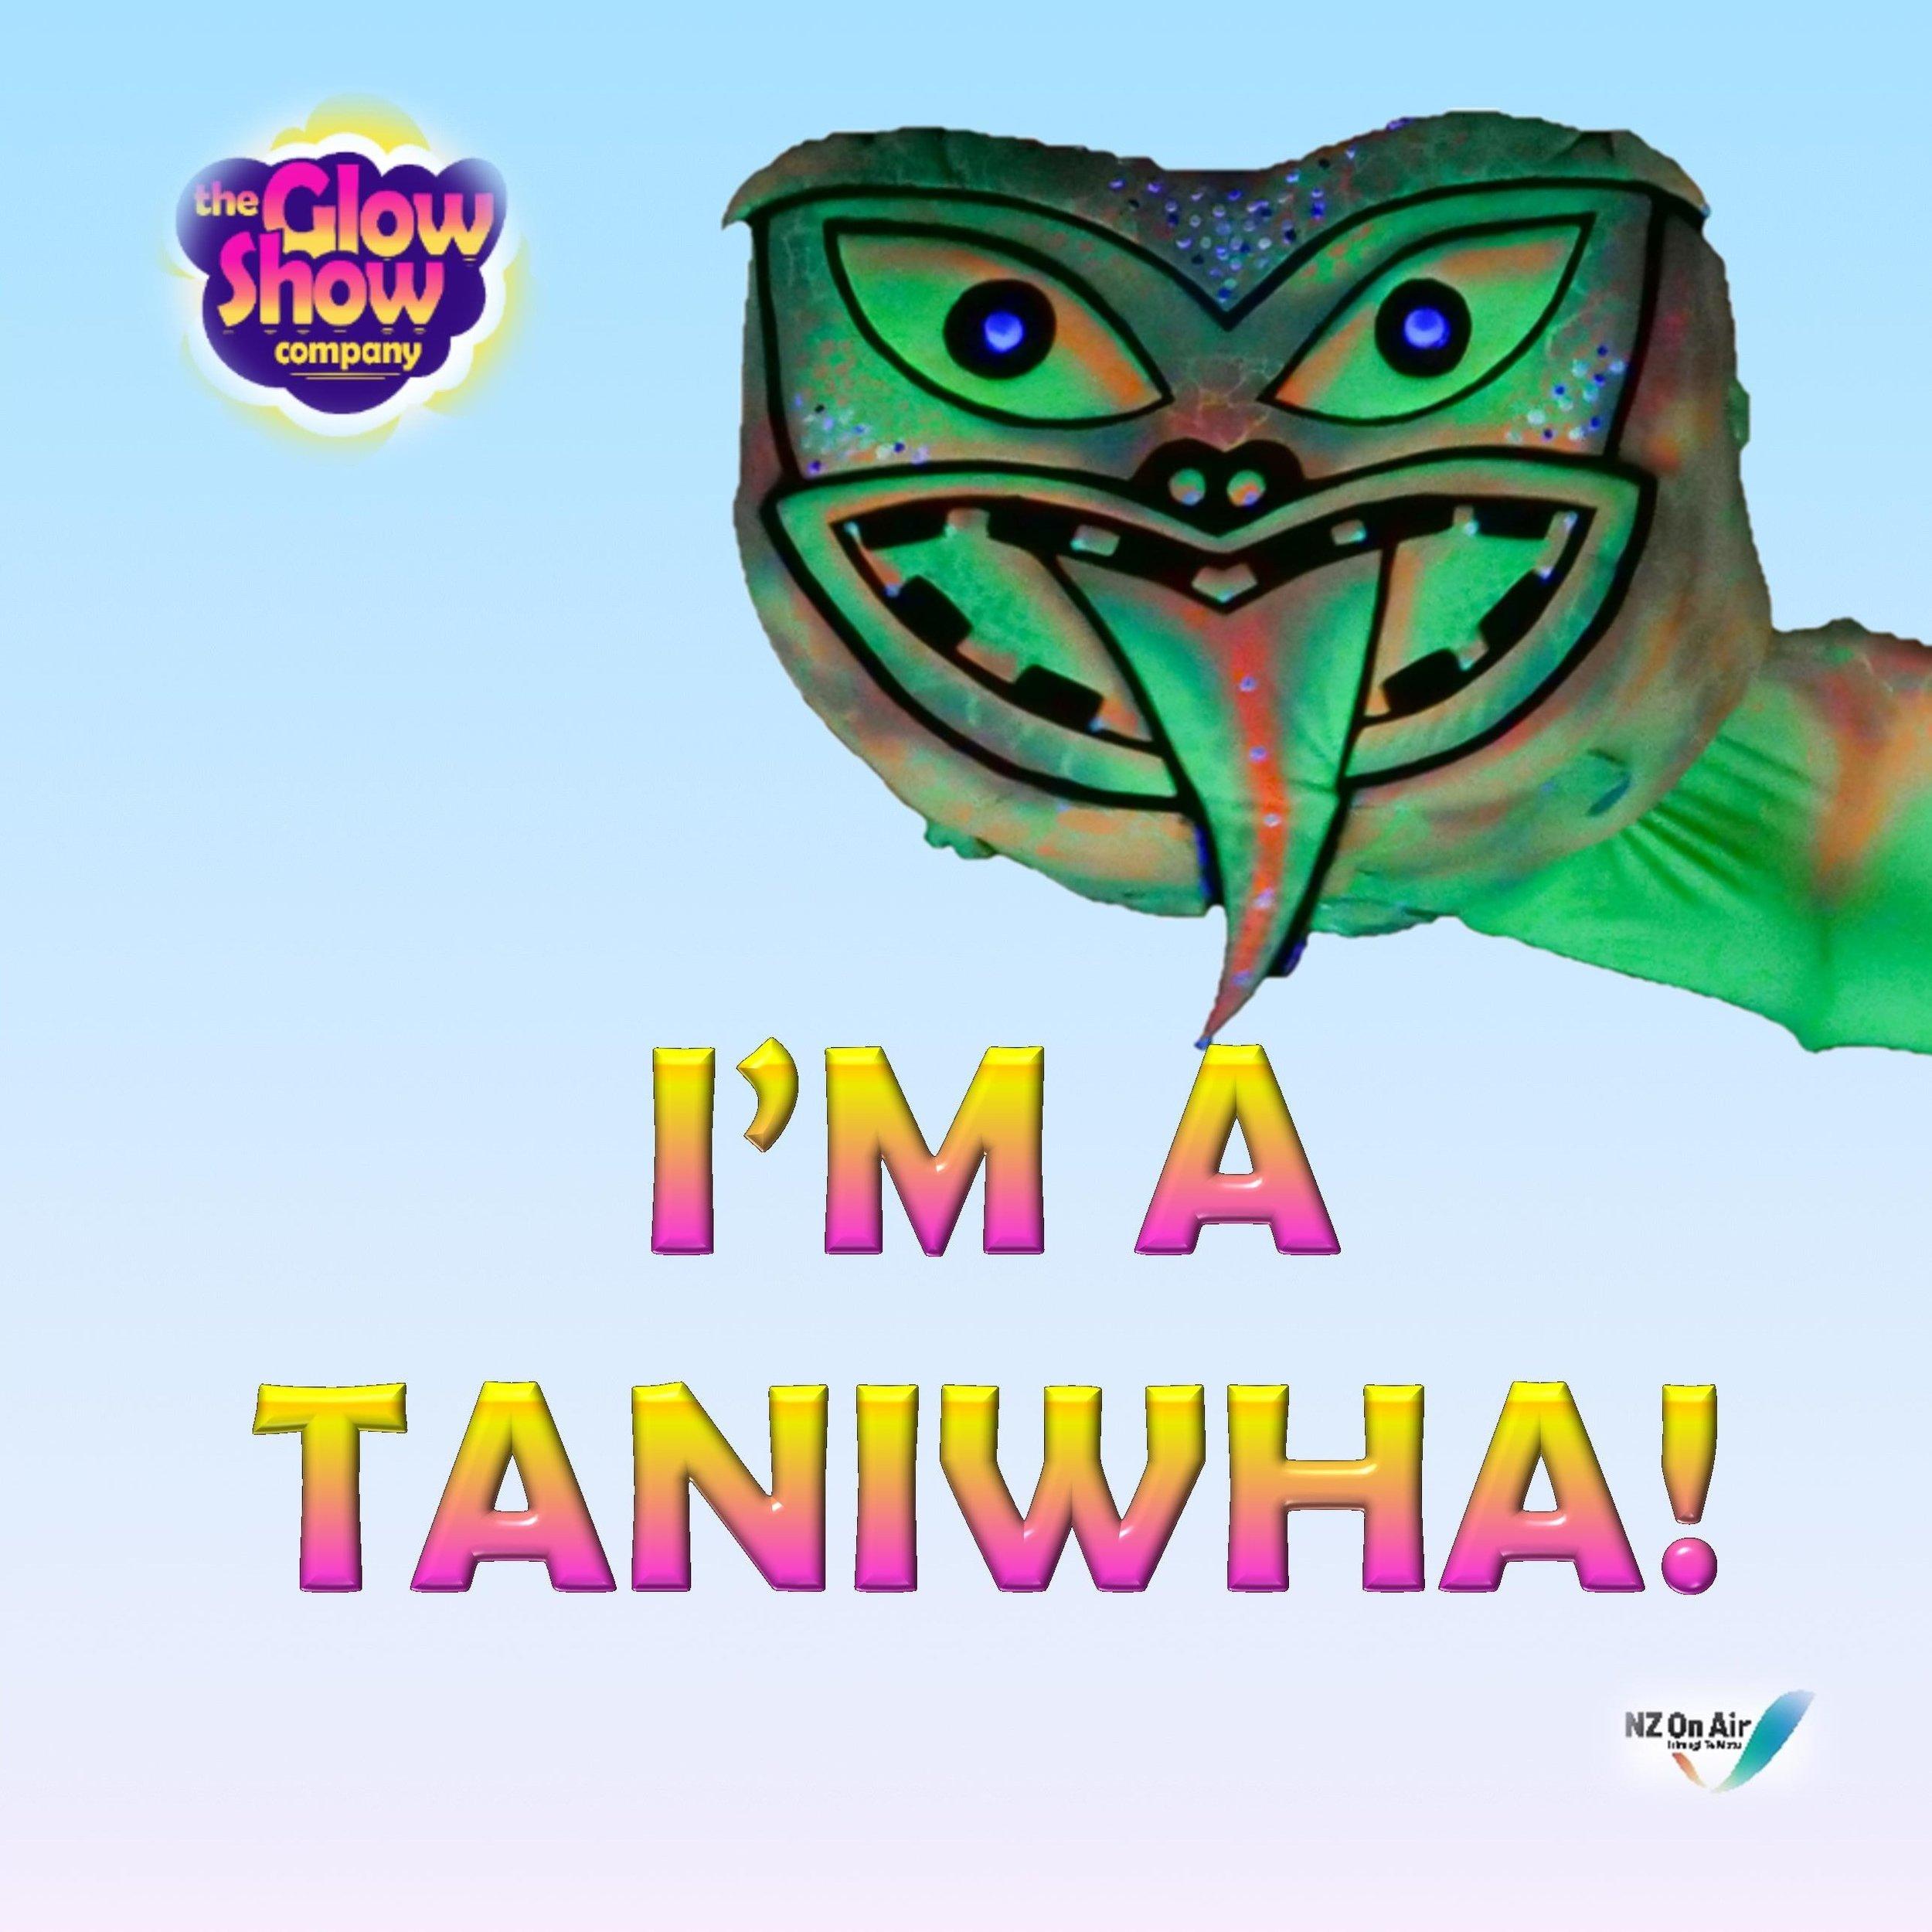 I'M A TANIWHA THUMBNAIL.jpg